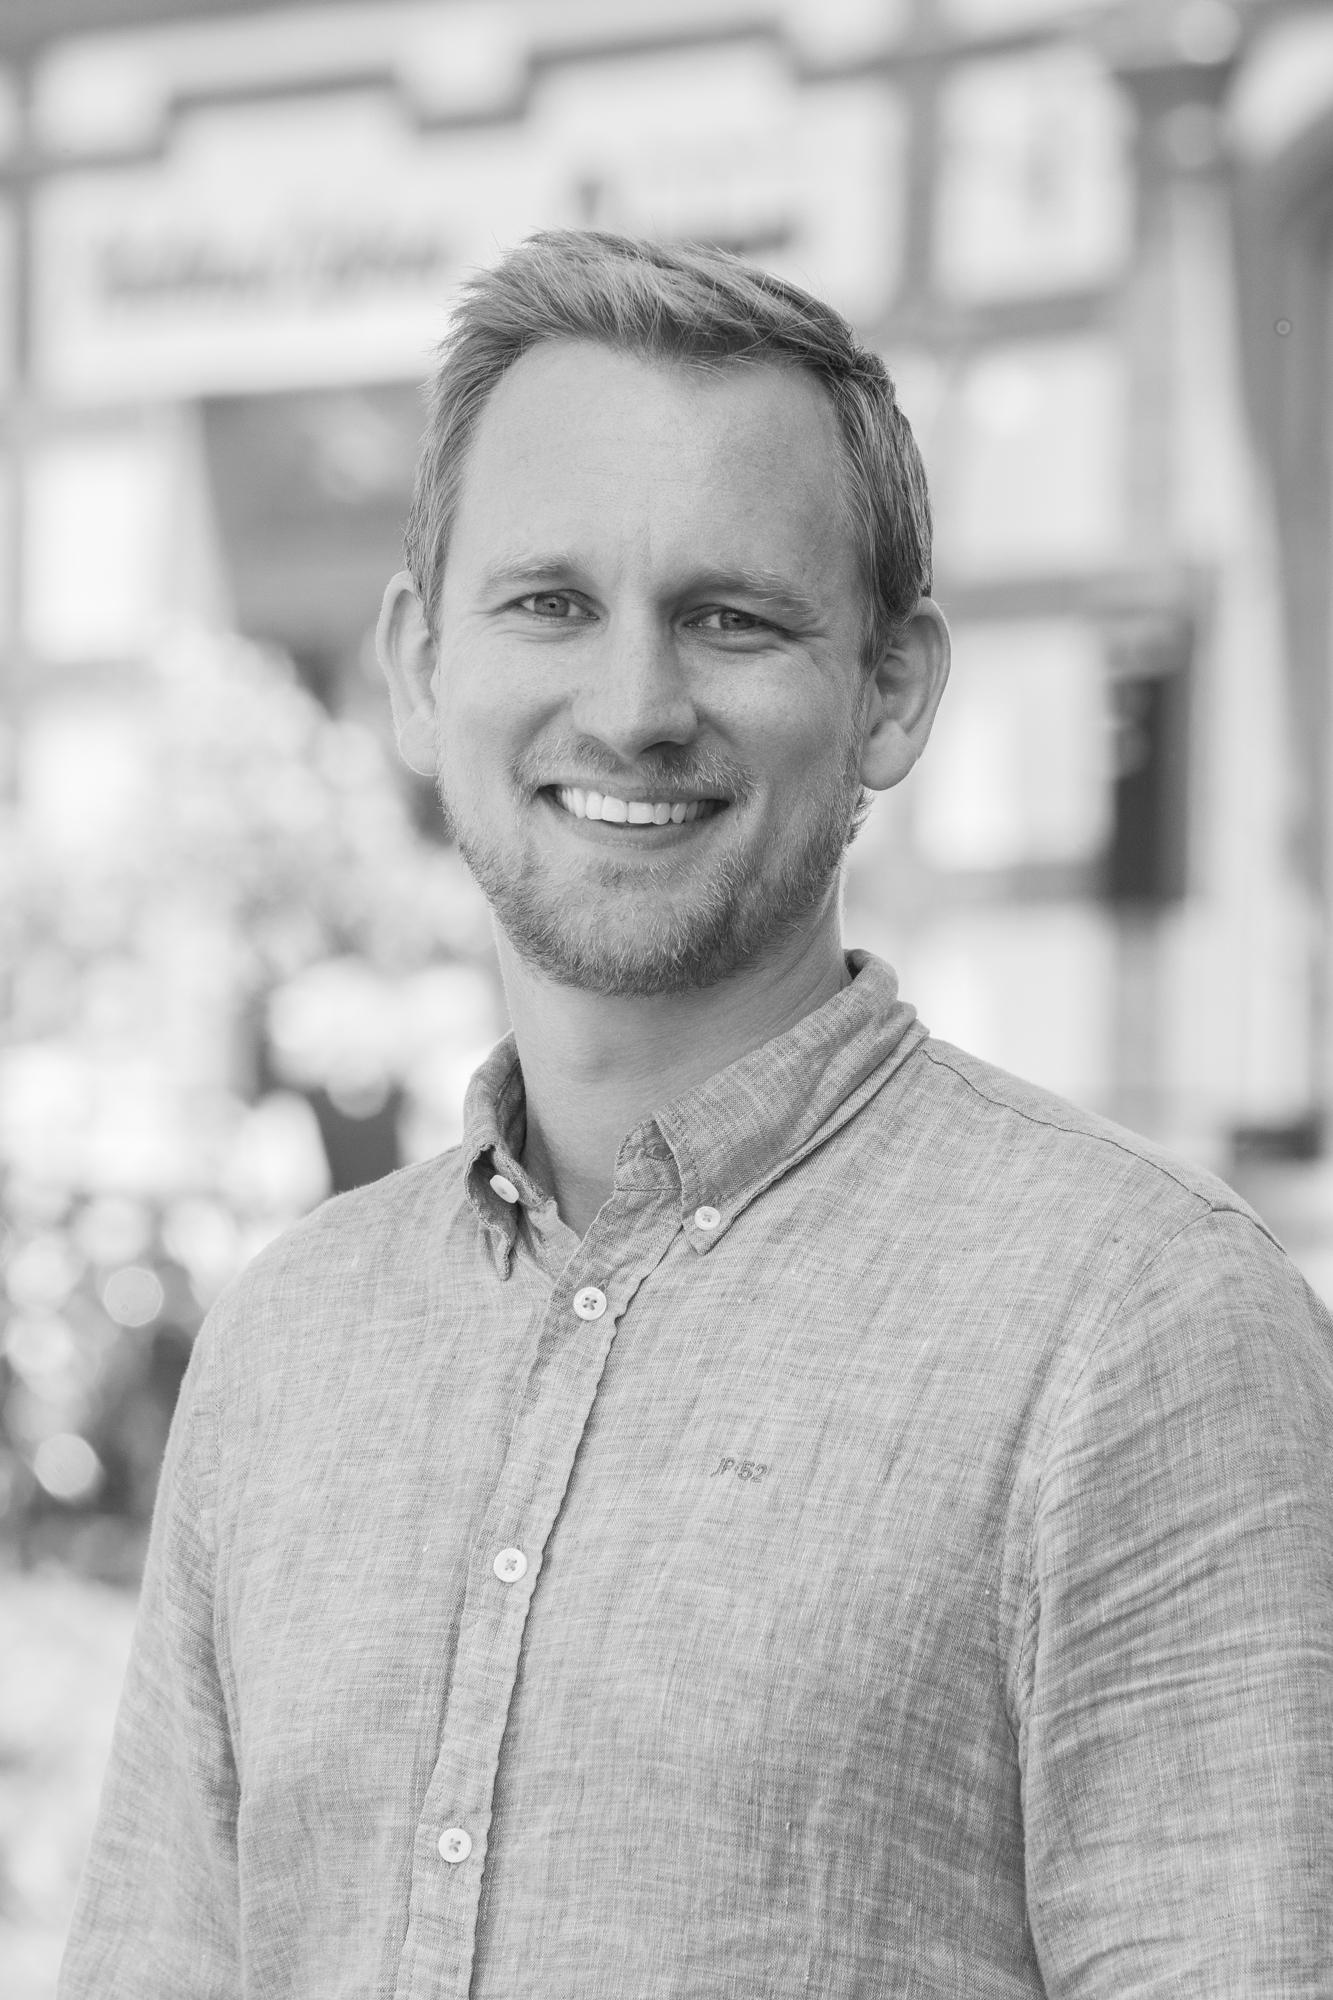 Anders Iglebekk